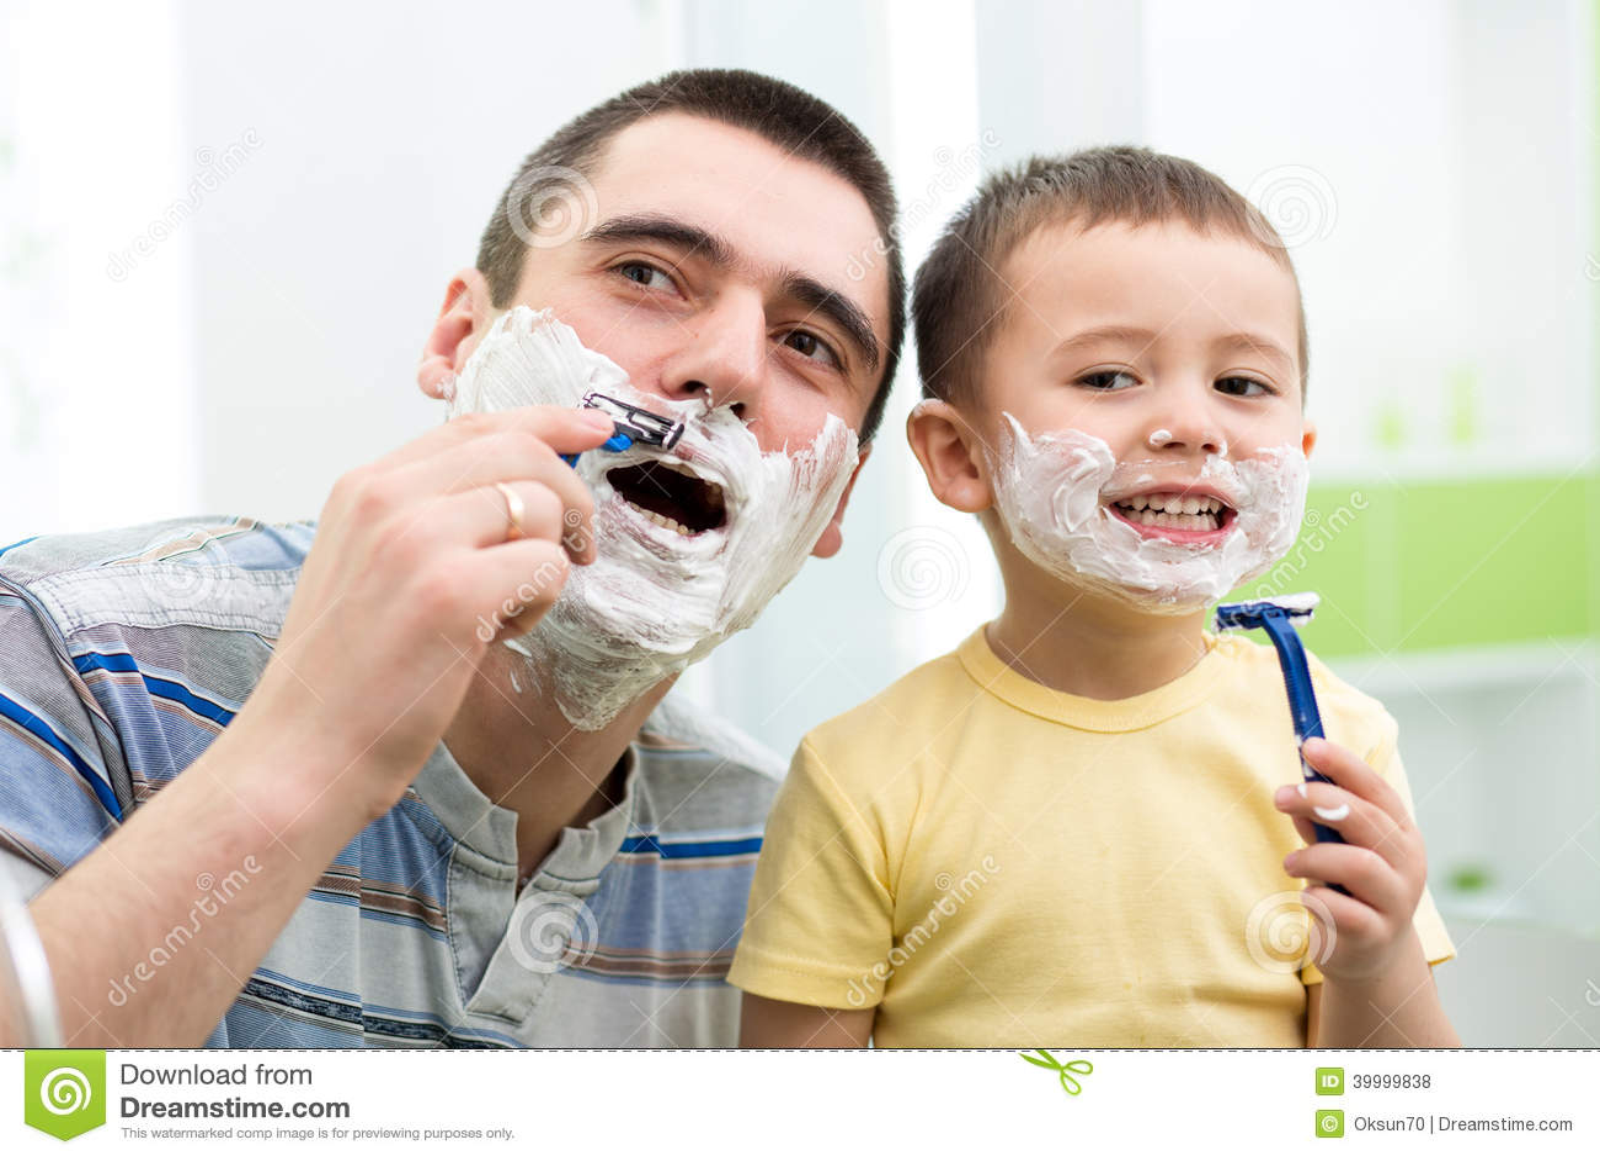 Ni o peque o que intenta afeitar como su pap foto de - Foto nino pequeno ...